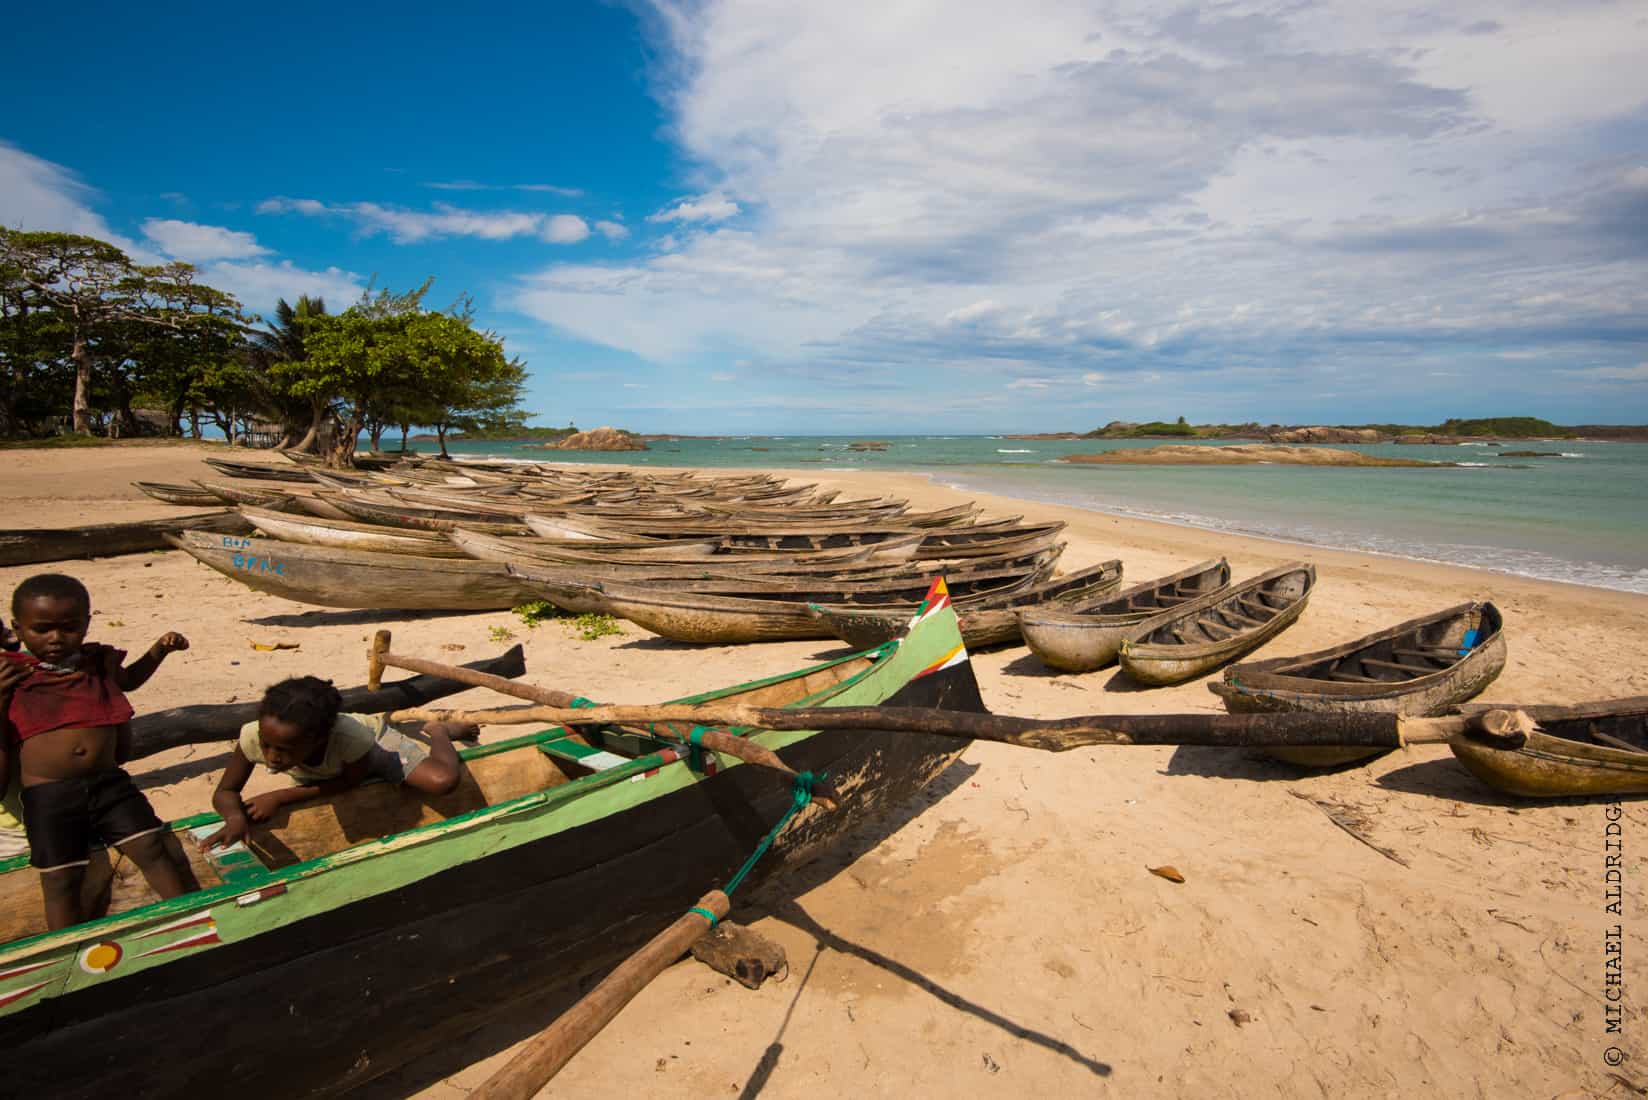 Fishing village in Madagascar